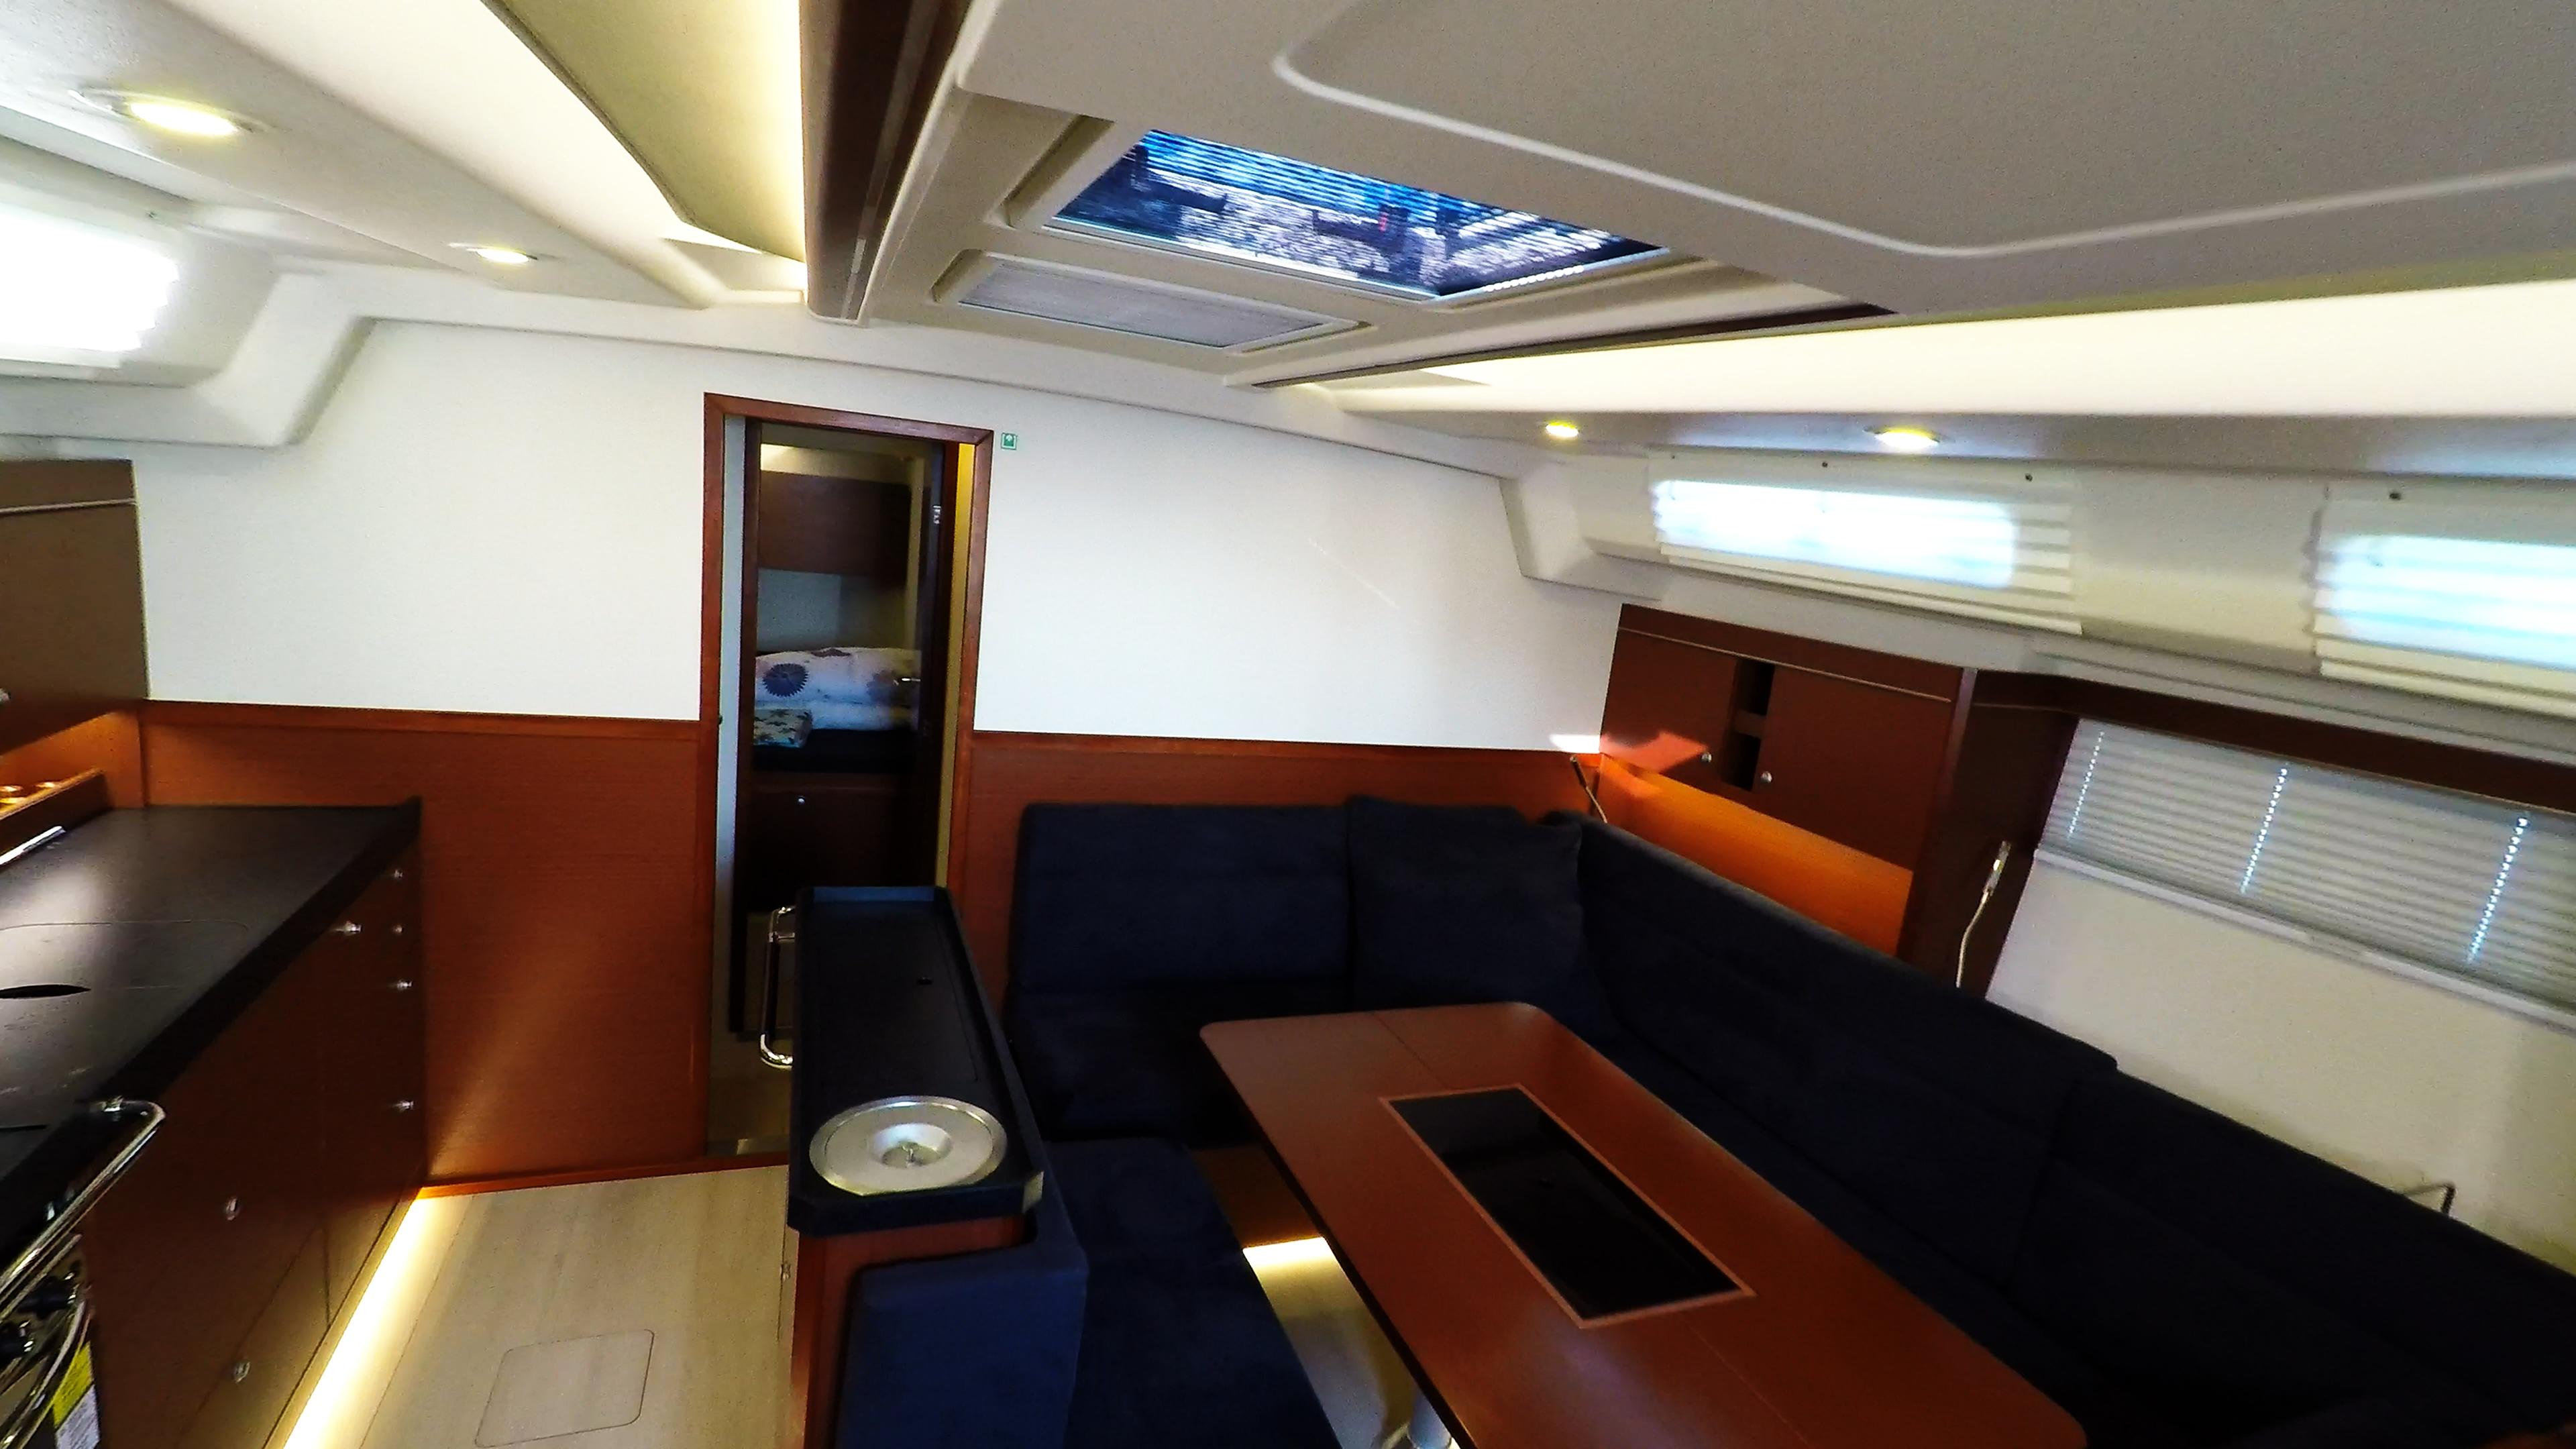 salon jedrilica Hanse 505 unutrašnjost brodska kuhinja